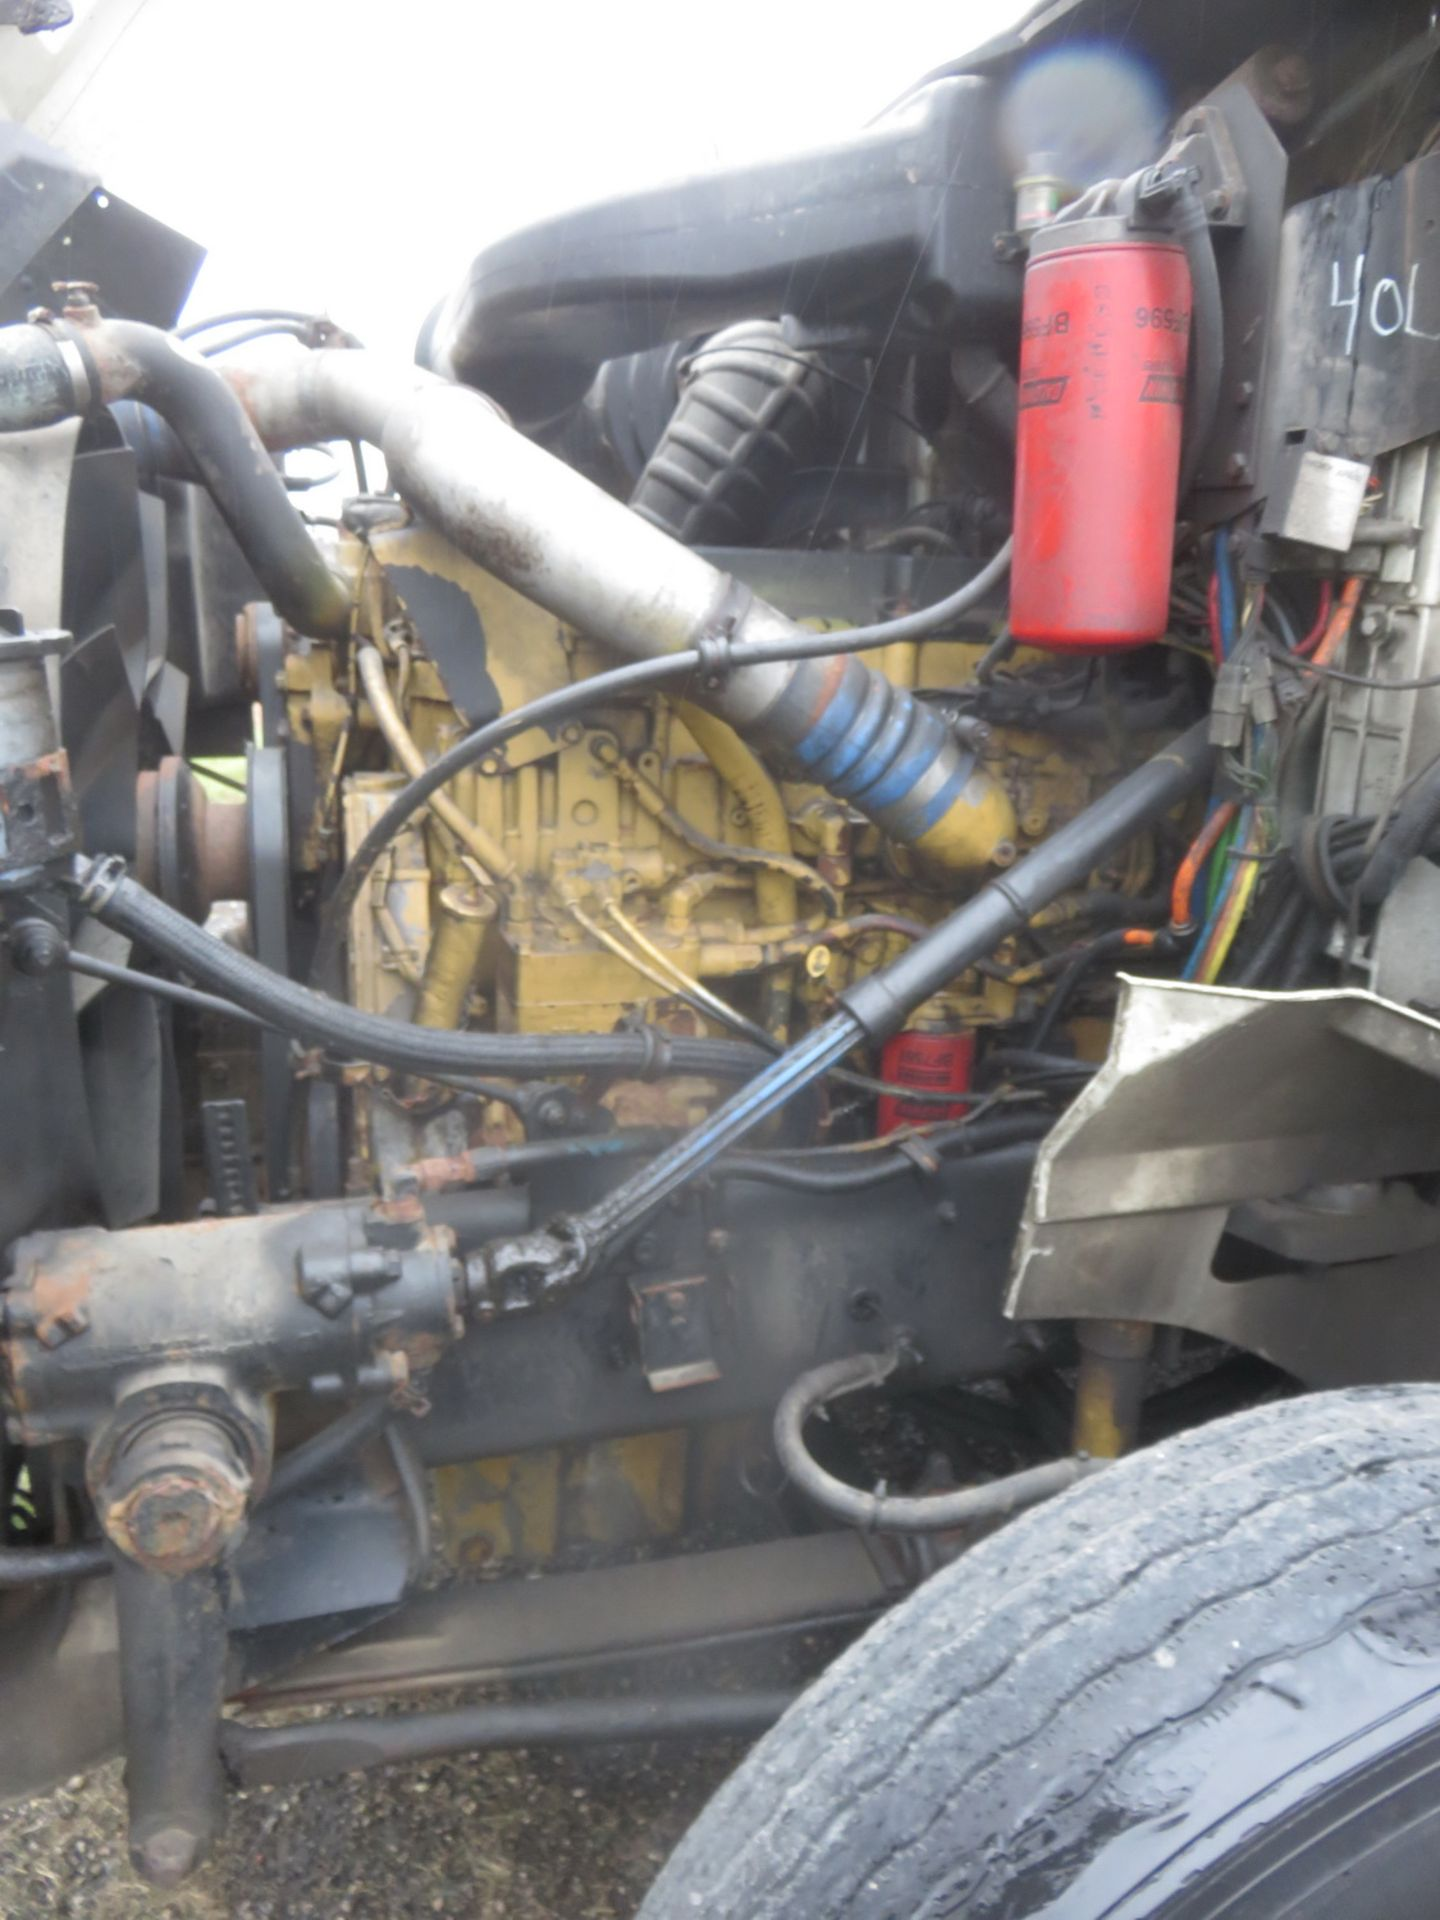 INTERNATIONAL NAVISTAR 9200I TANDEM AXLE HIGHWAY TRACTOR W/ CATERPILLAR C13 12.5L DIESEL ENGINE, - Image 4 of 5